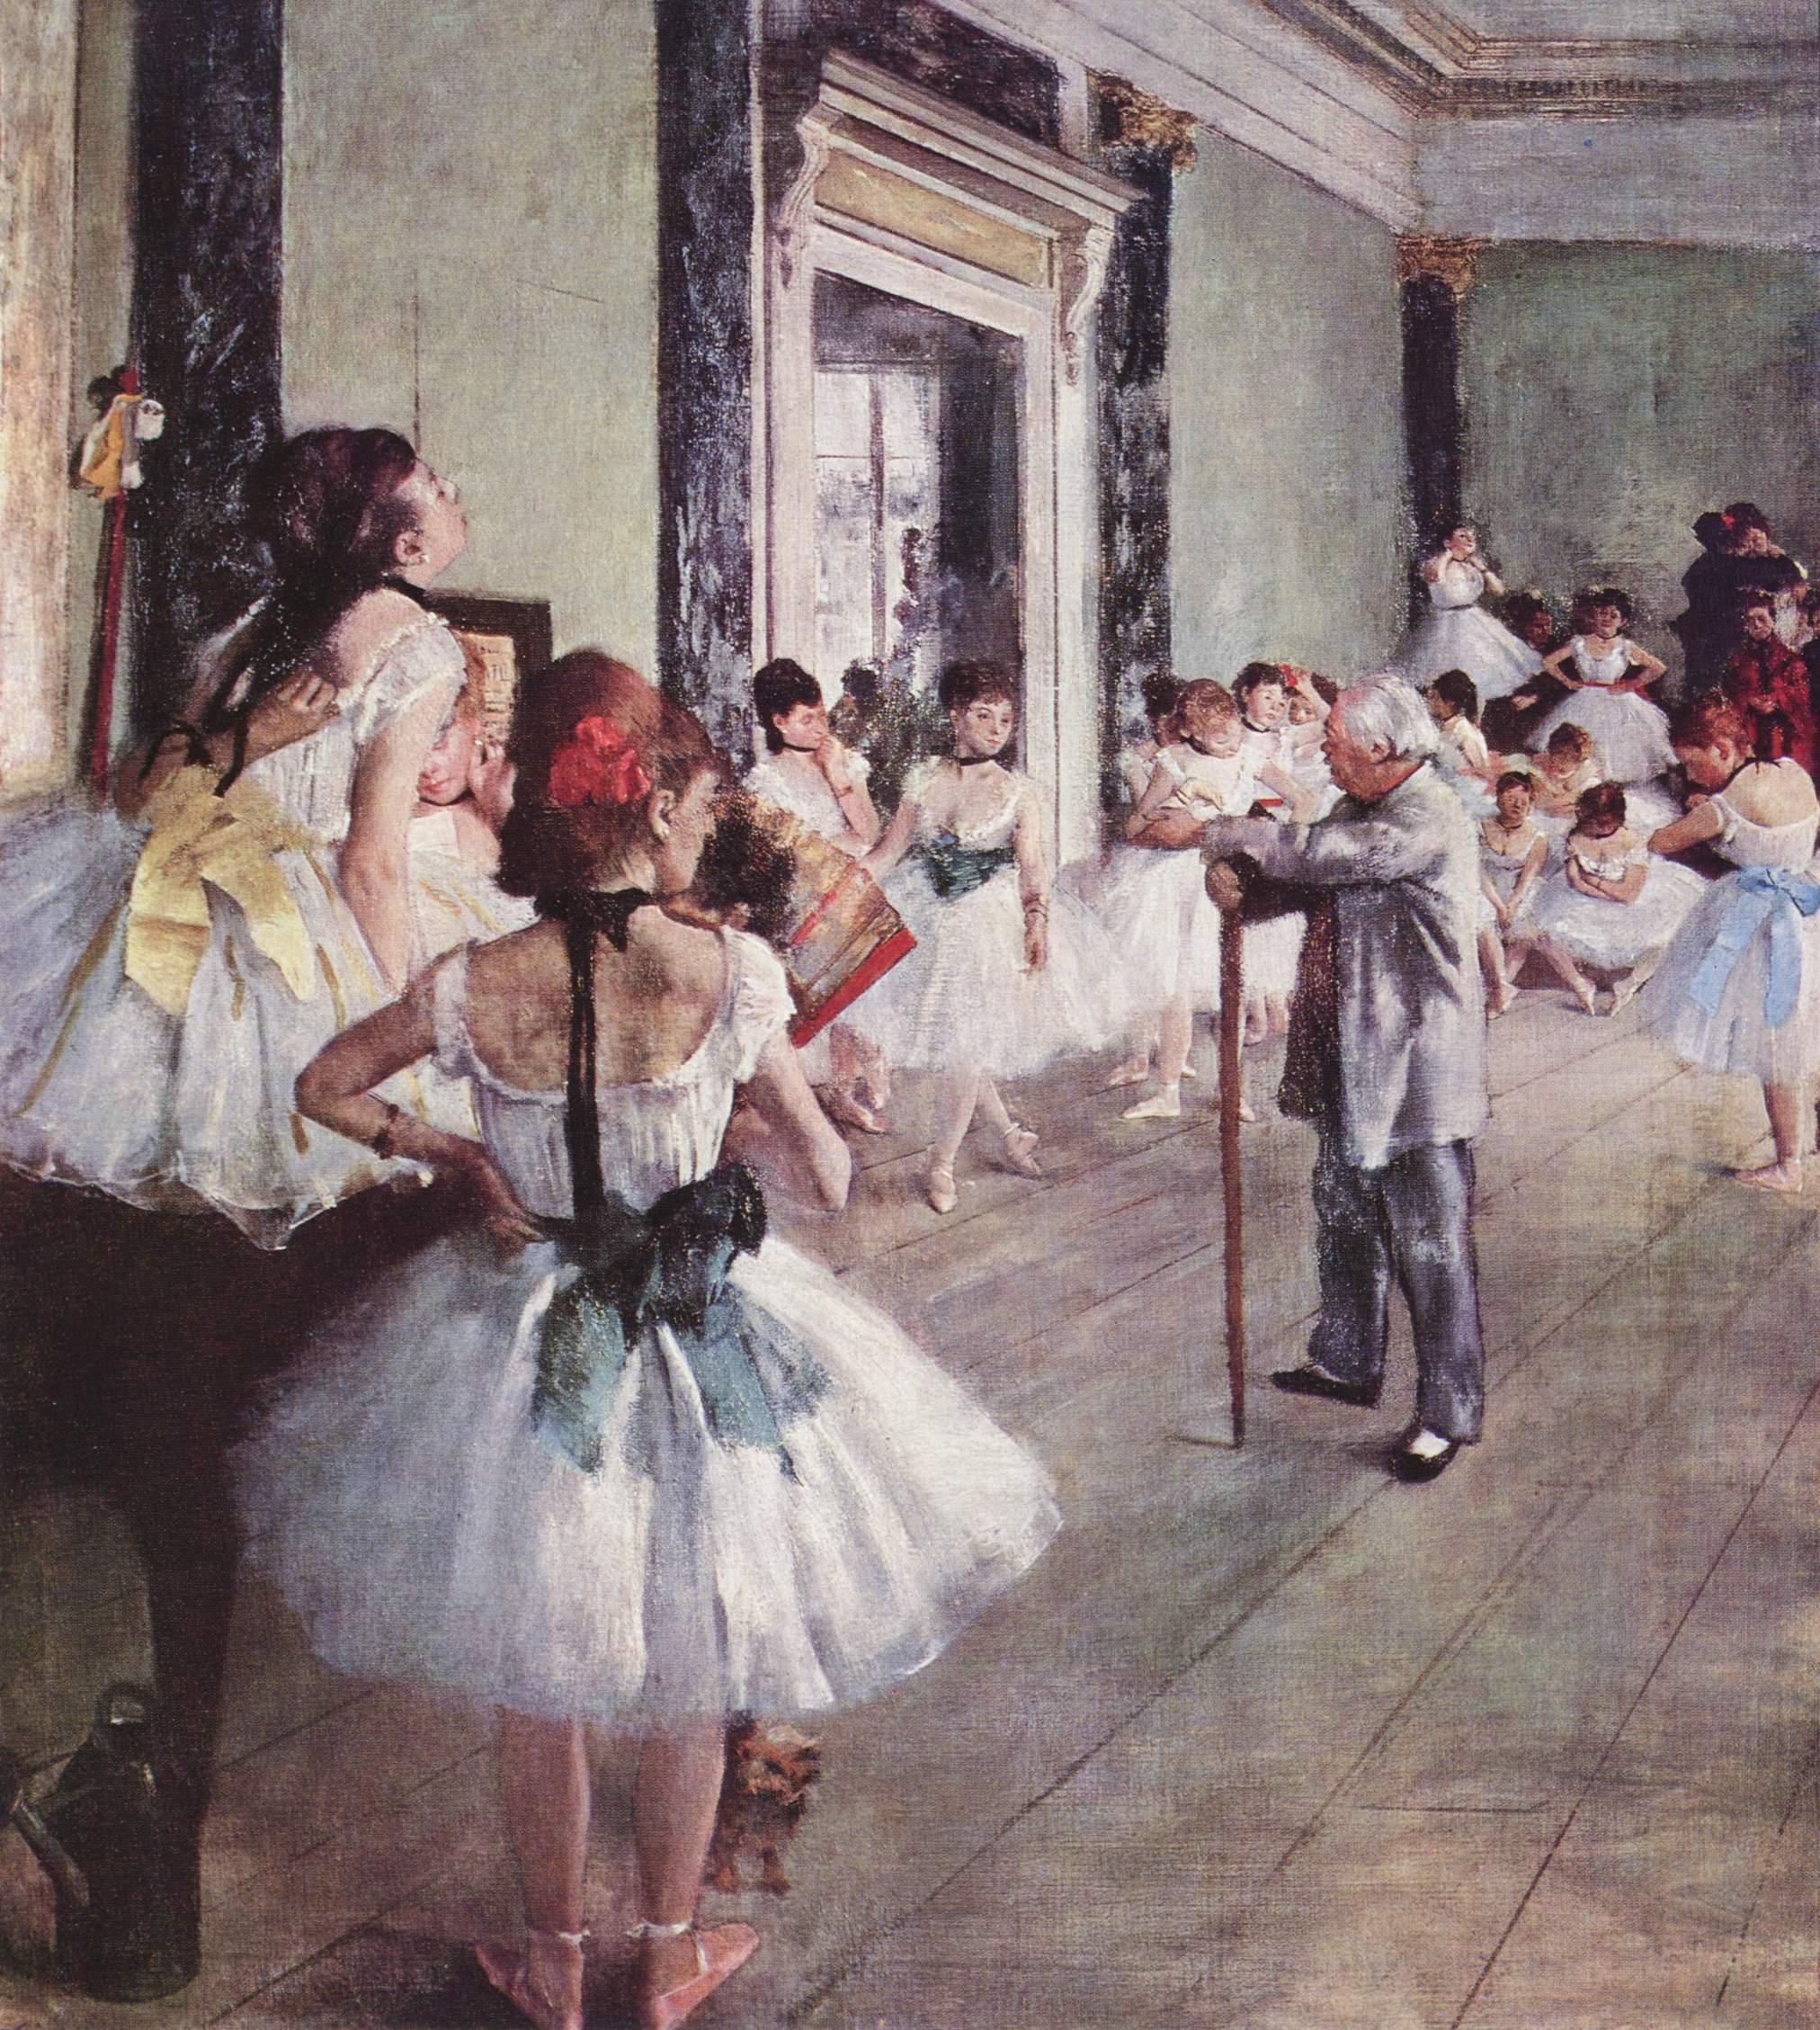 Edgar_Germain_Hilaire_Degas_021.jpg